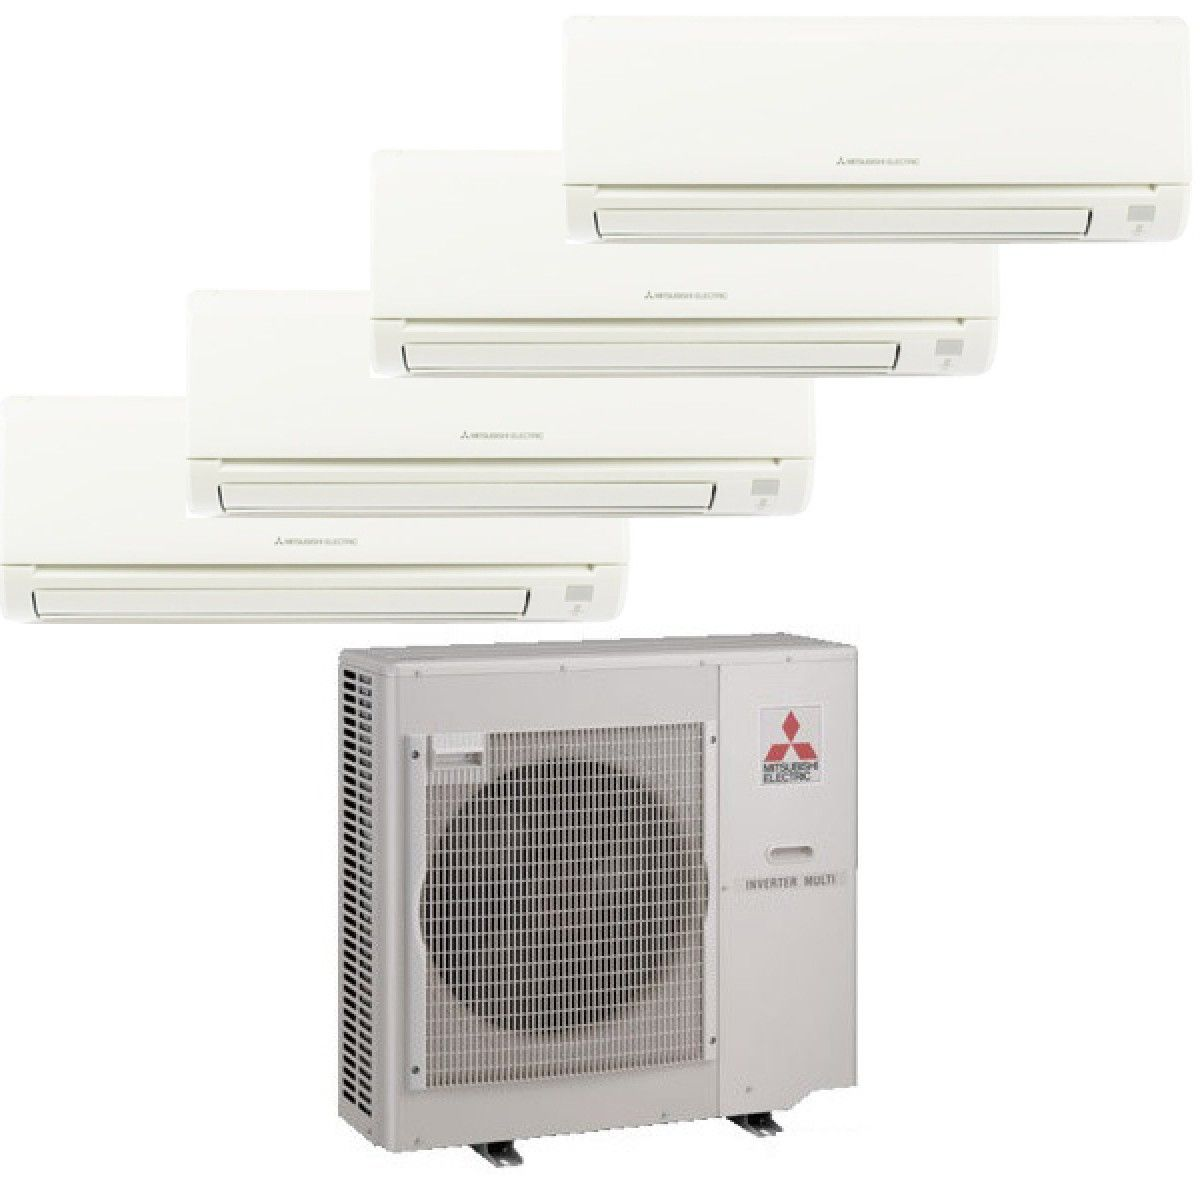 mr slim mitsubishi air conditioner manual